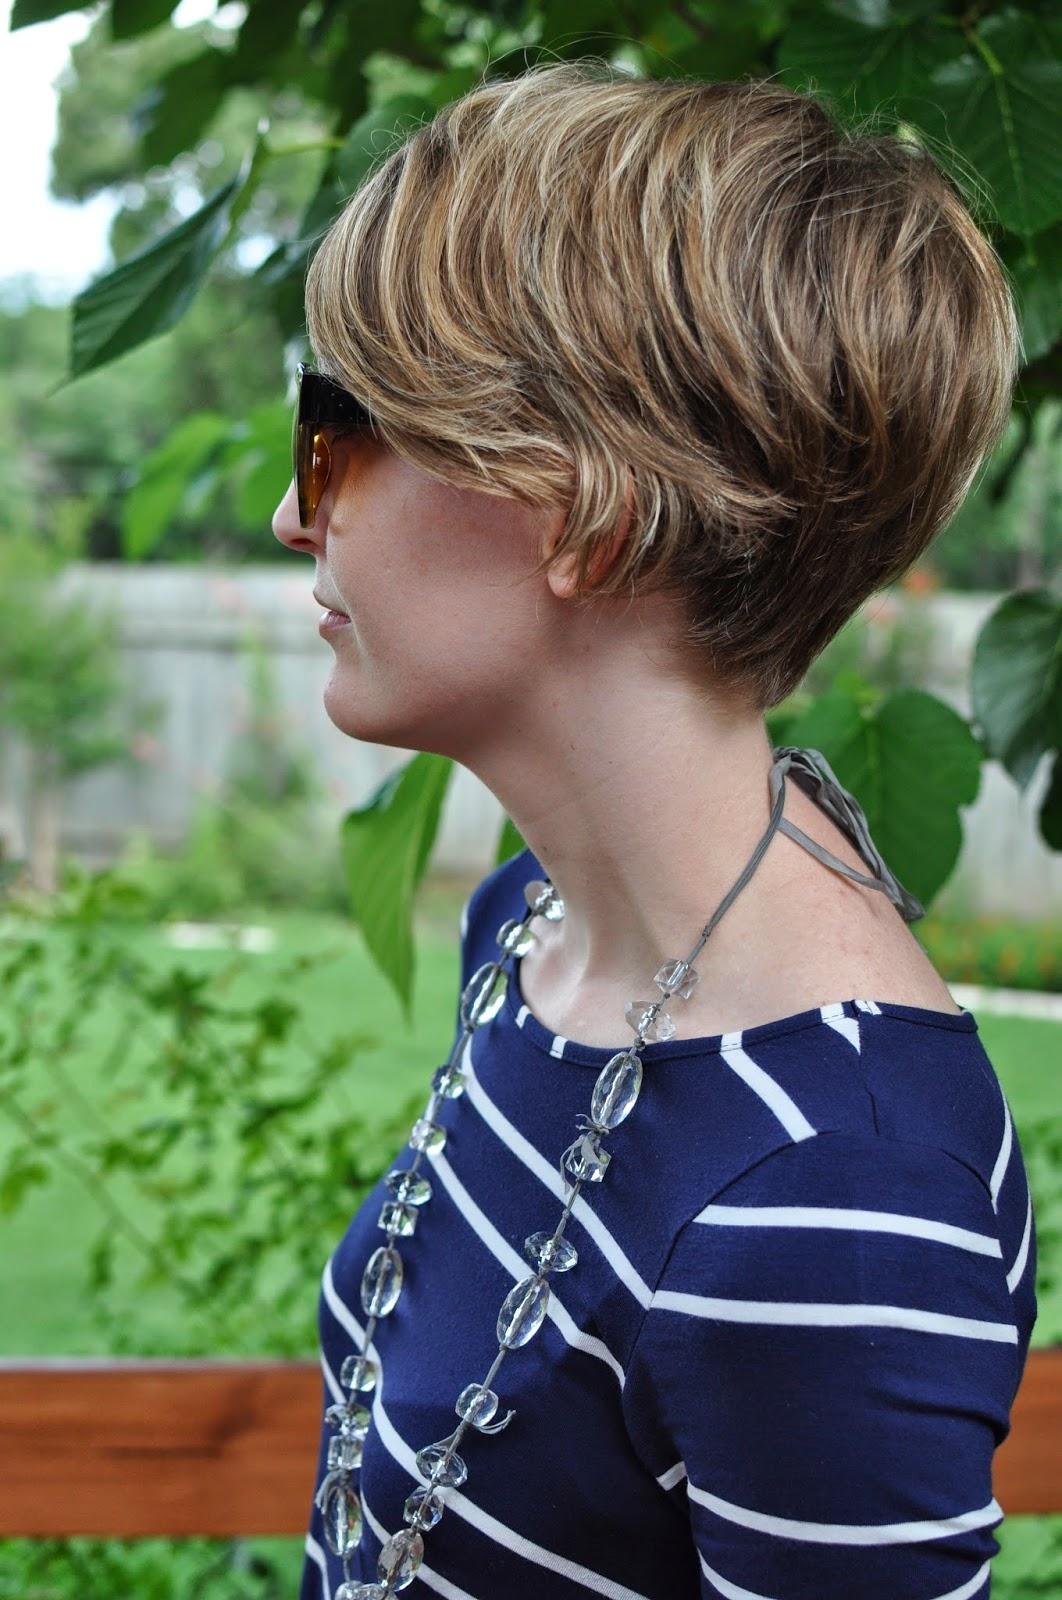 Short hair style - Waterstone Salon - Austin, TX